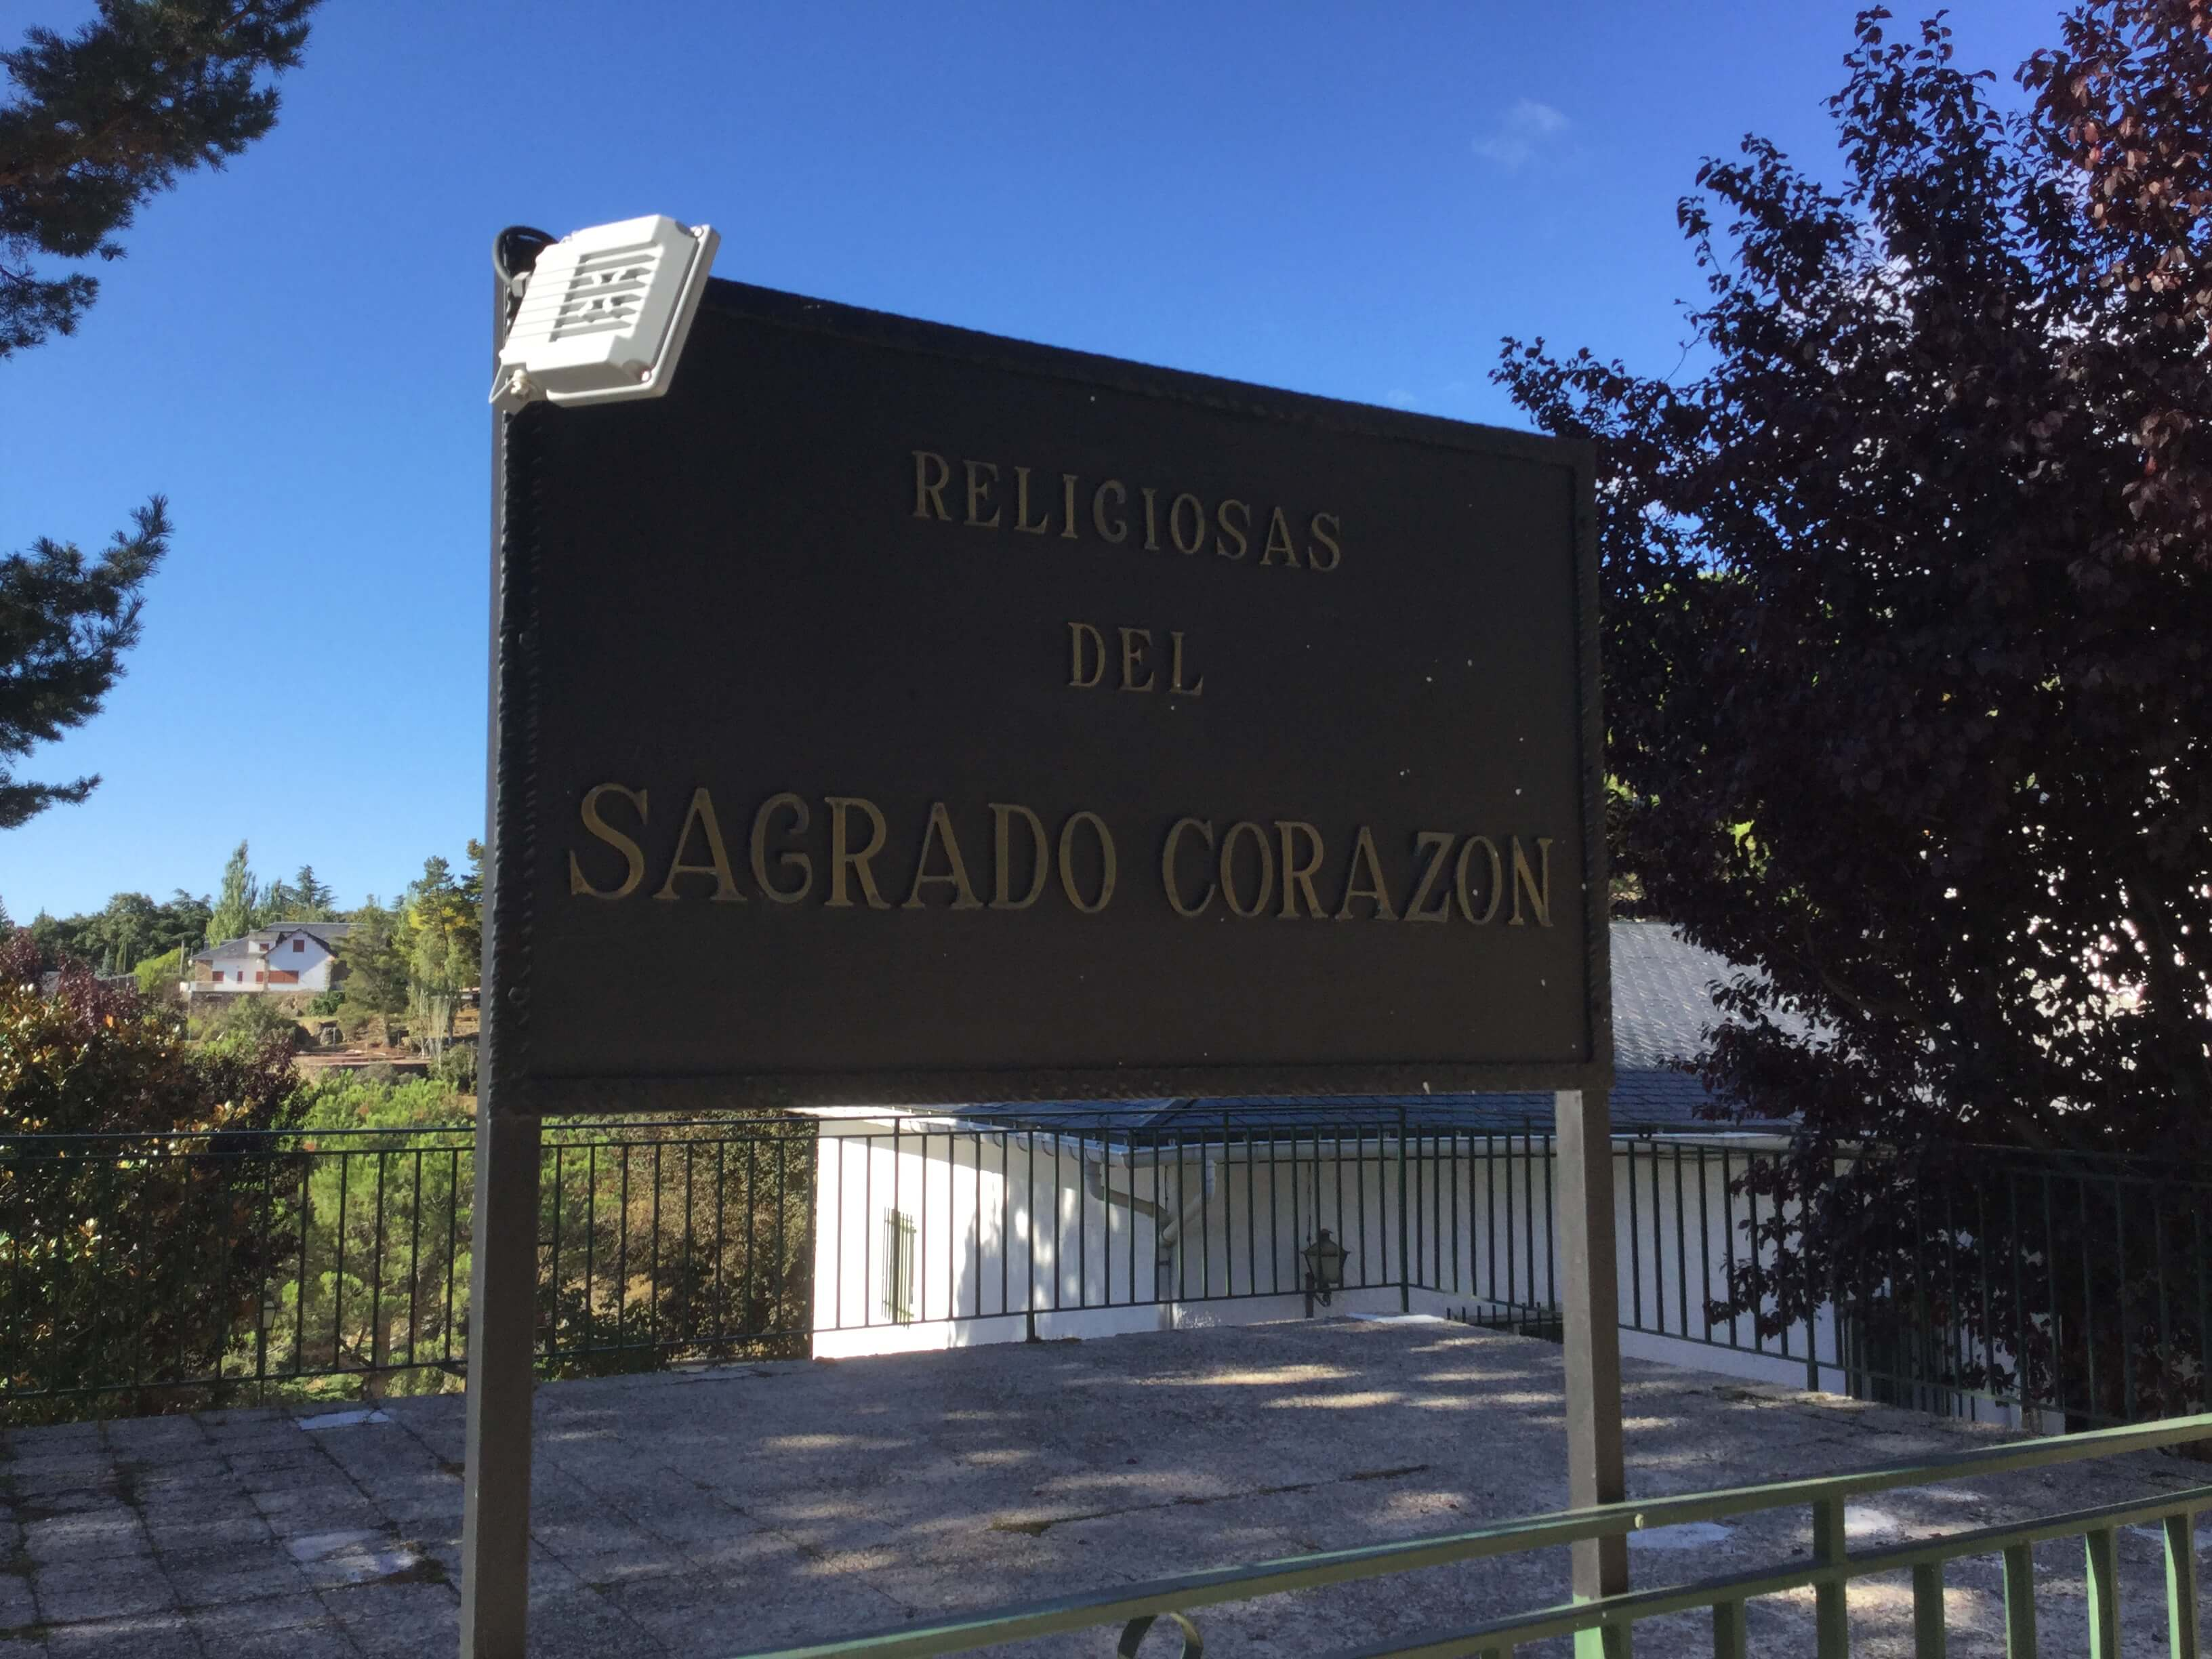 MIRAFLORES DE LA SIERRA RSCJ